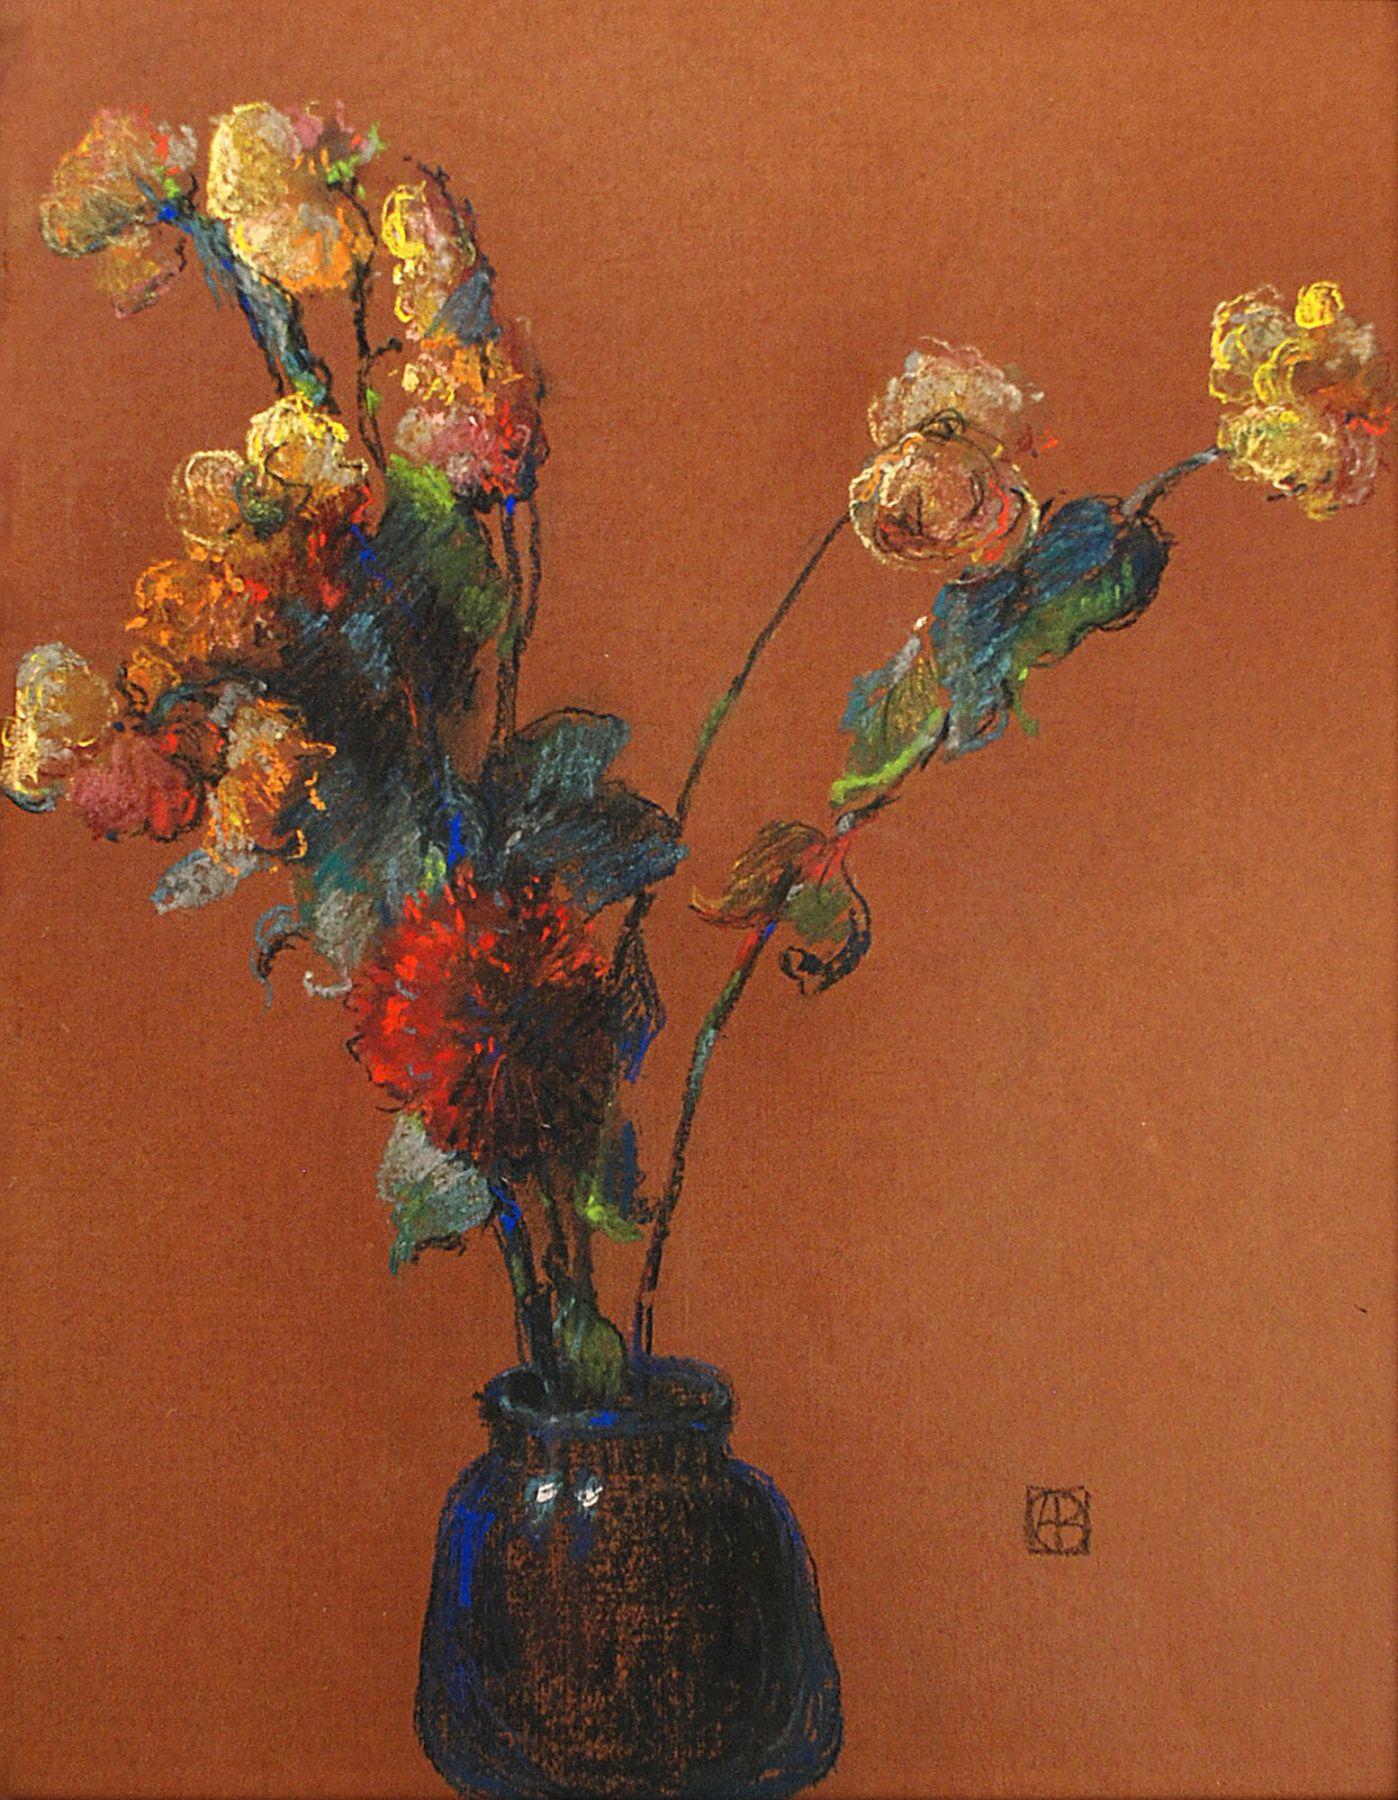 LEON DABO (1864-1960), Abstraction avec un Zinnia, c. 1915